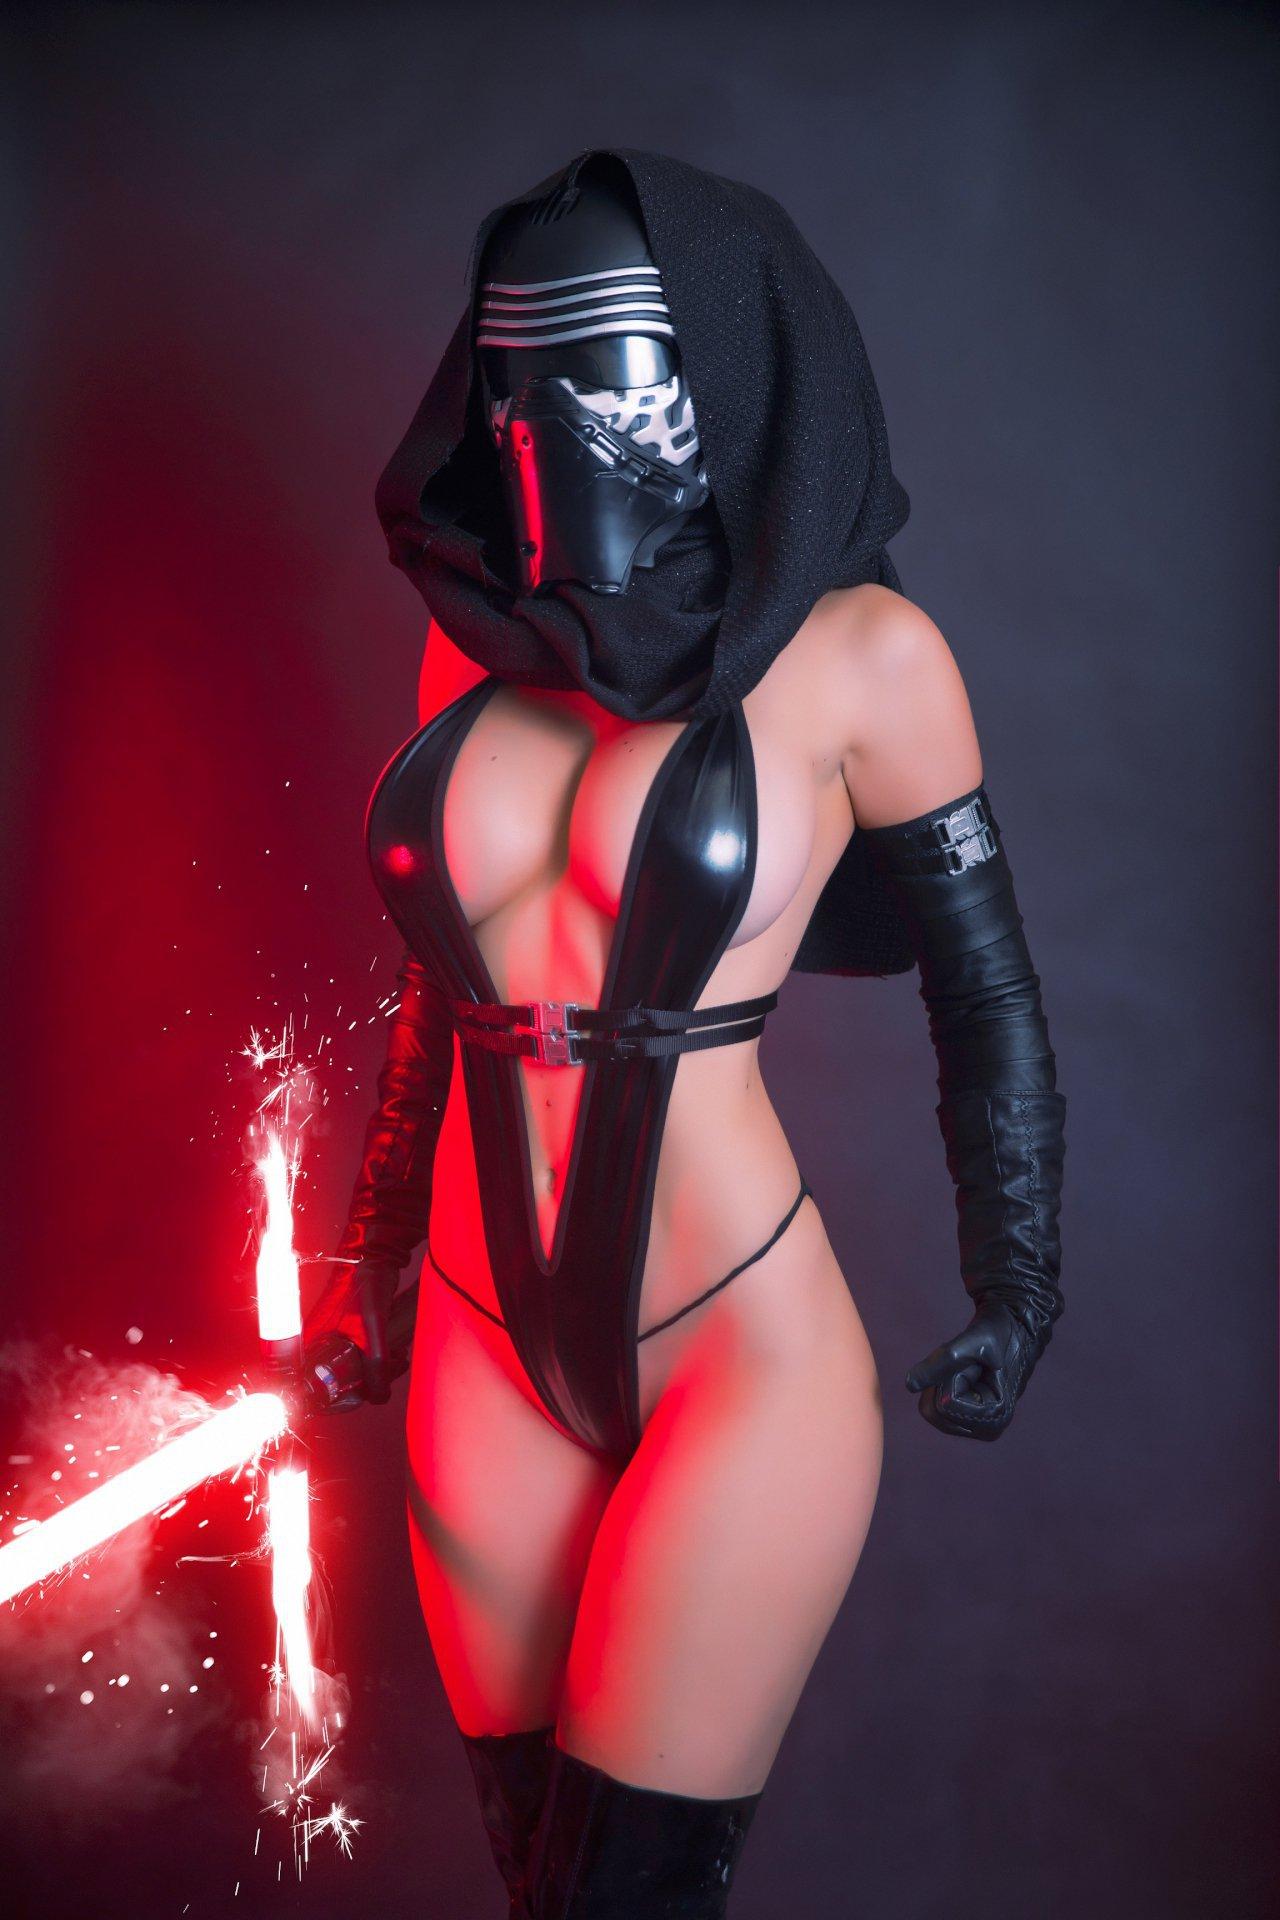 Is Jessica Nigri the sexiest Jedi Warrior ever